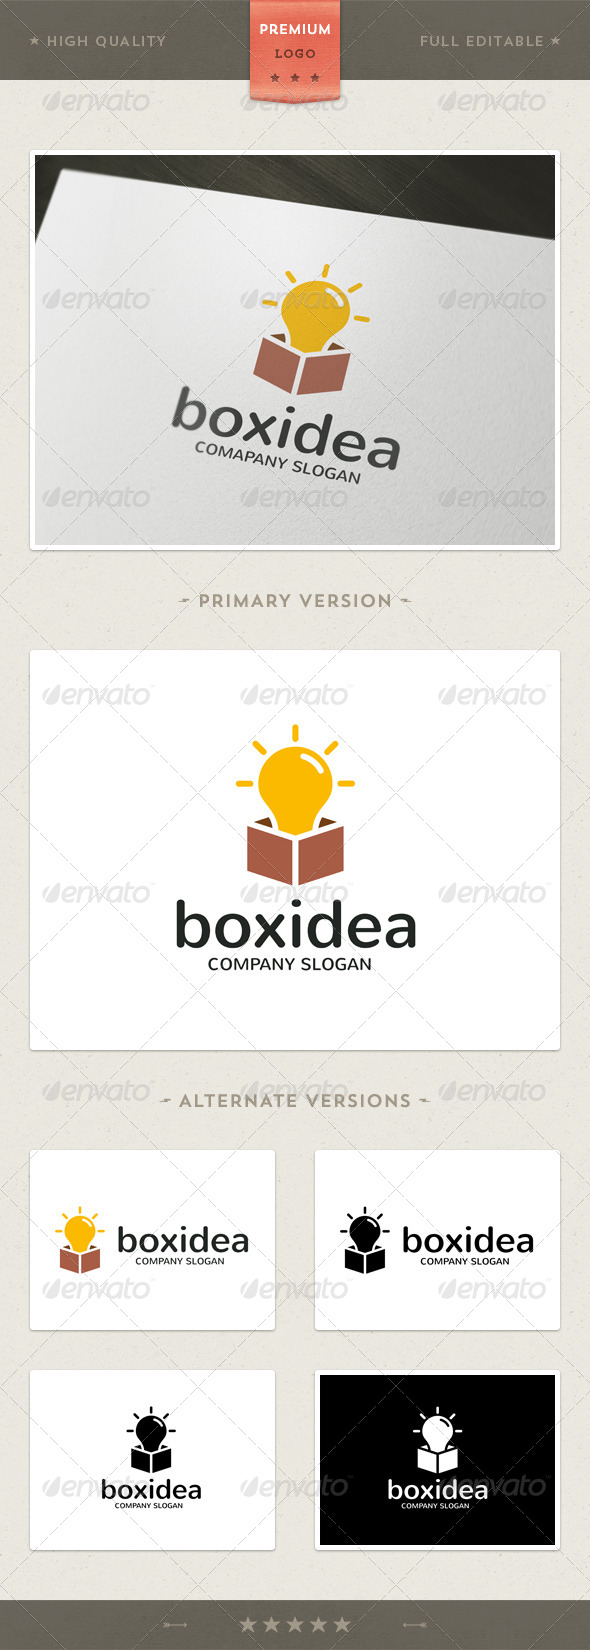 Box Idea Logo Template - Objects Logo Templates